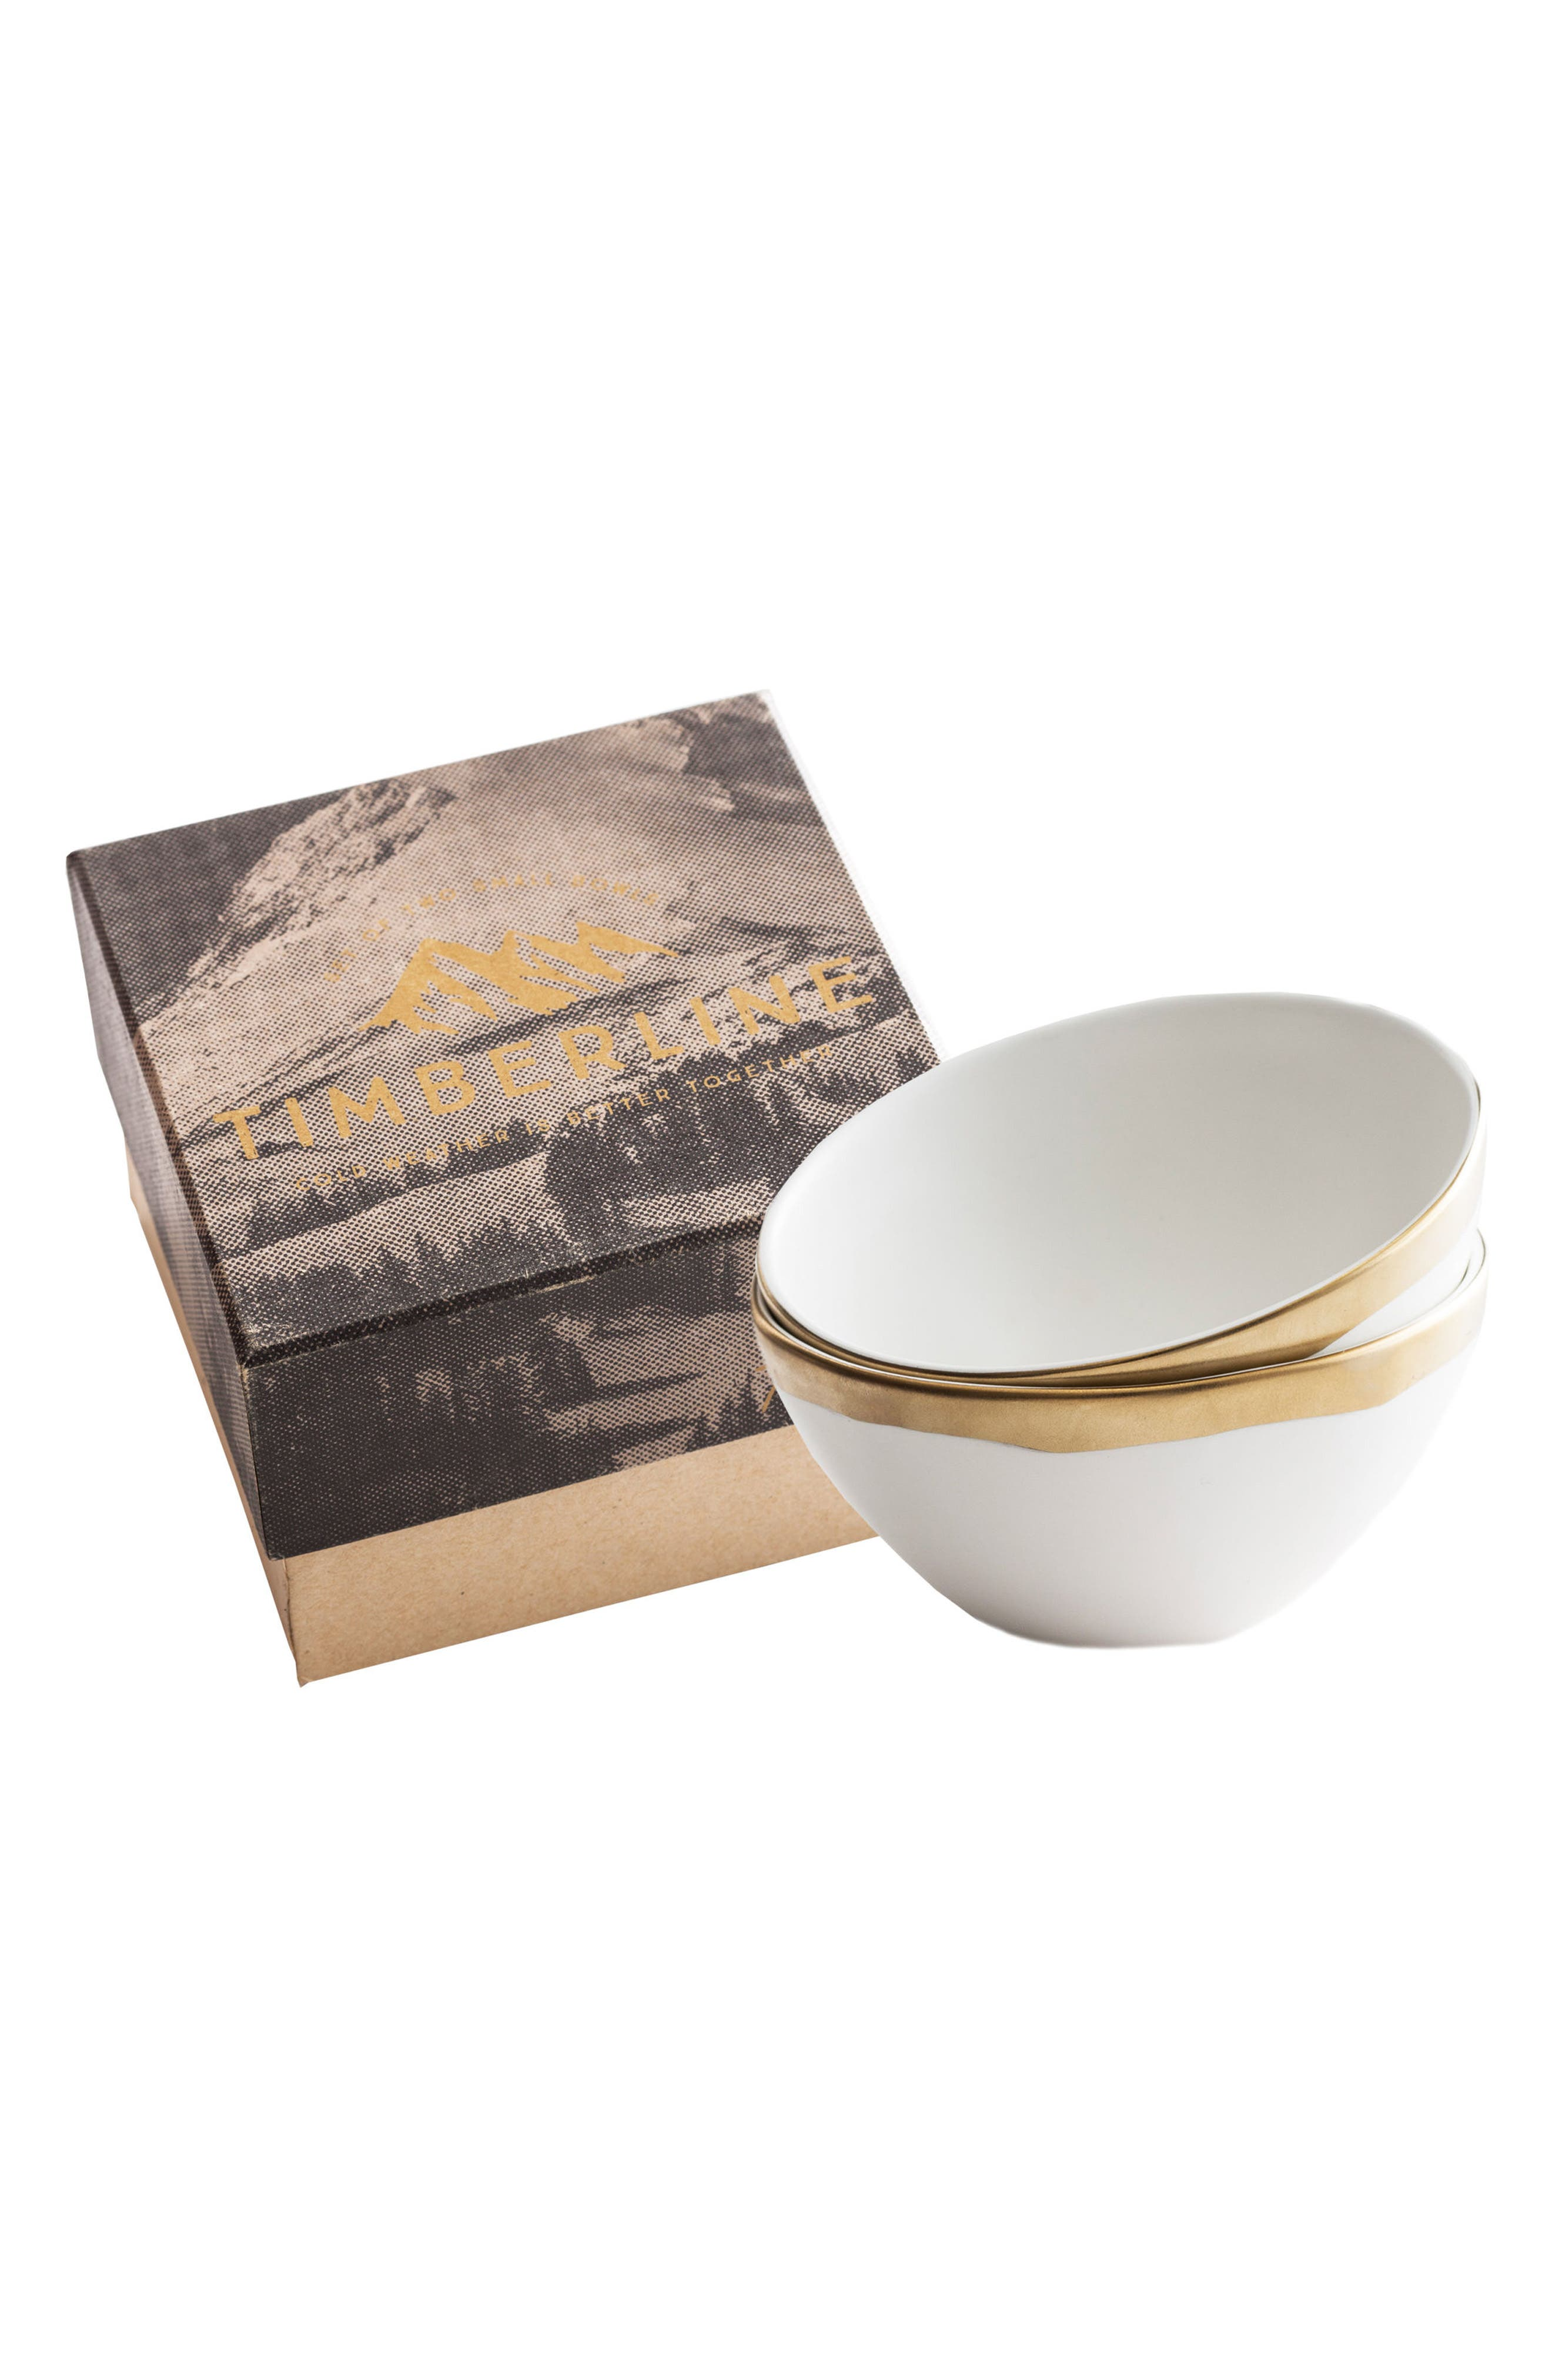 Main Image - Rosanna Timberline Set of 2 Porcelain Bowls